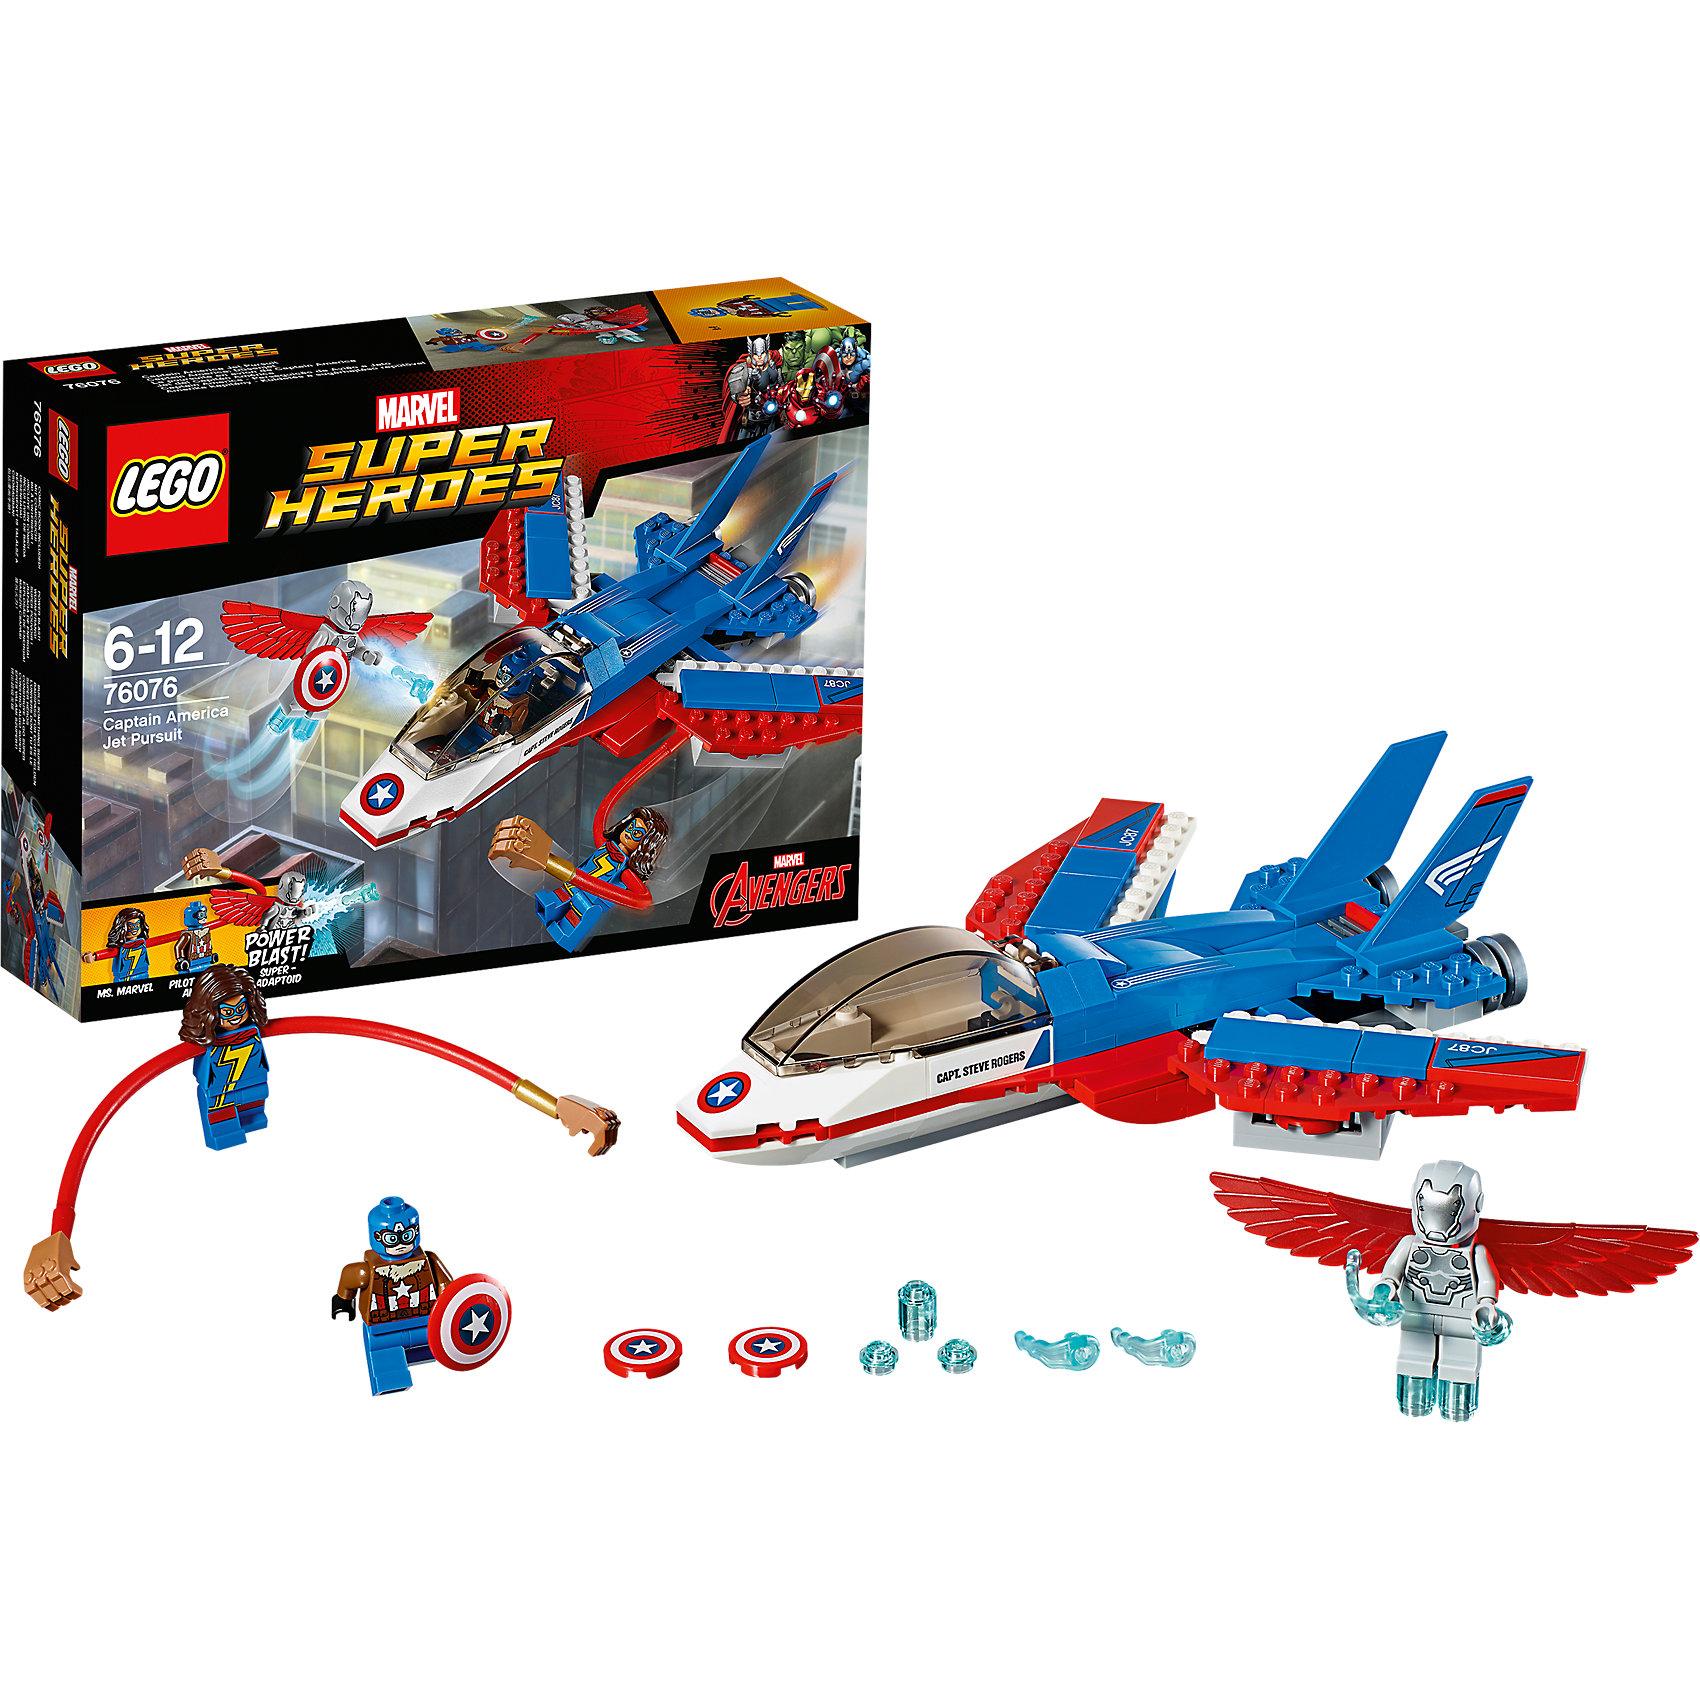 LEGO Super Heroes 76076: Воздушная погоня Капитана Америка<br><br>Ширина мм: 262<br>Глубина мм: 61<br>Высота мм: 191<br>Вес г: 176<br>Возраст от месяцев: 72<br>Возраст до месяцев: 144<br>Пол: Мужской<br>Возраст: Детский<br>SKU: 5002441